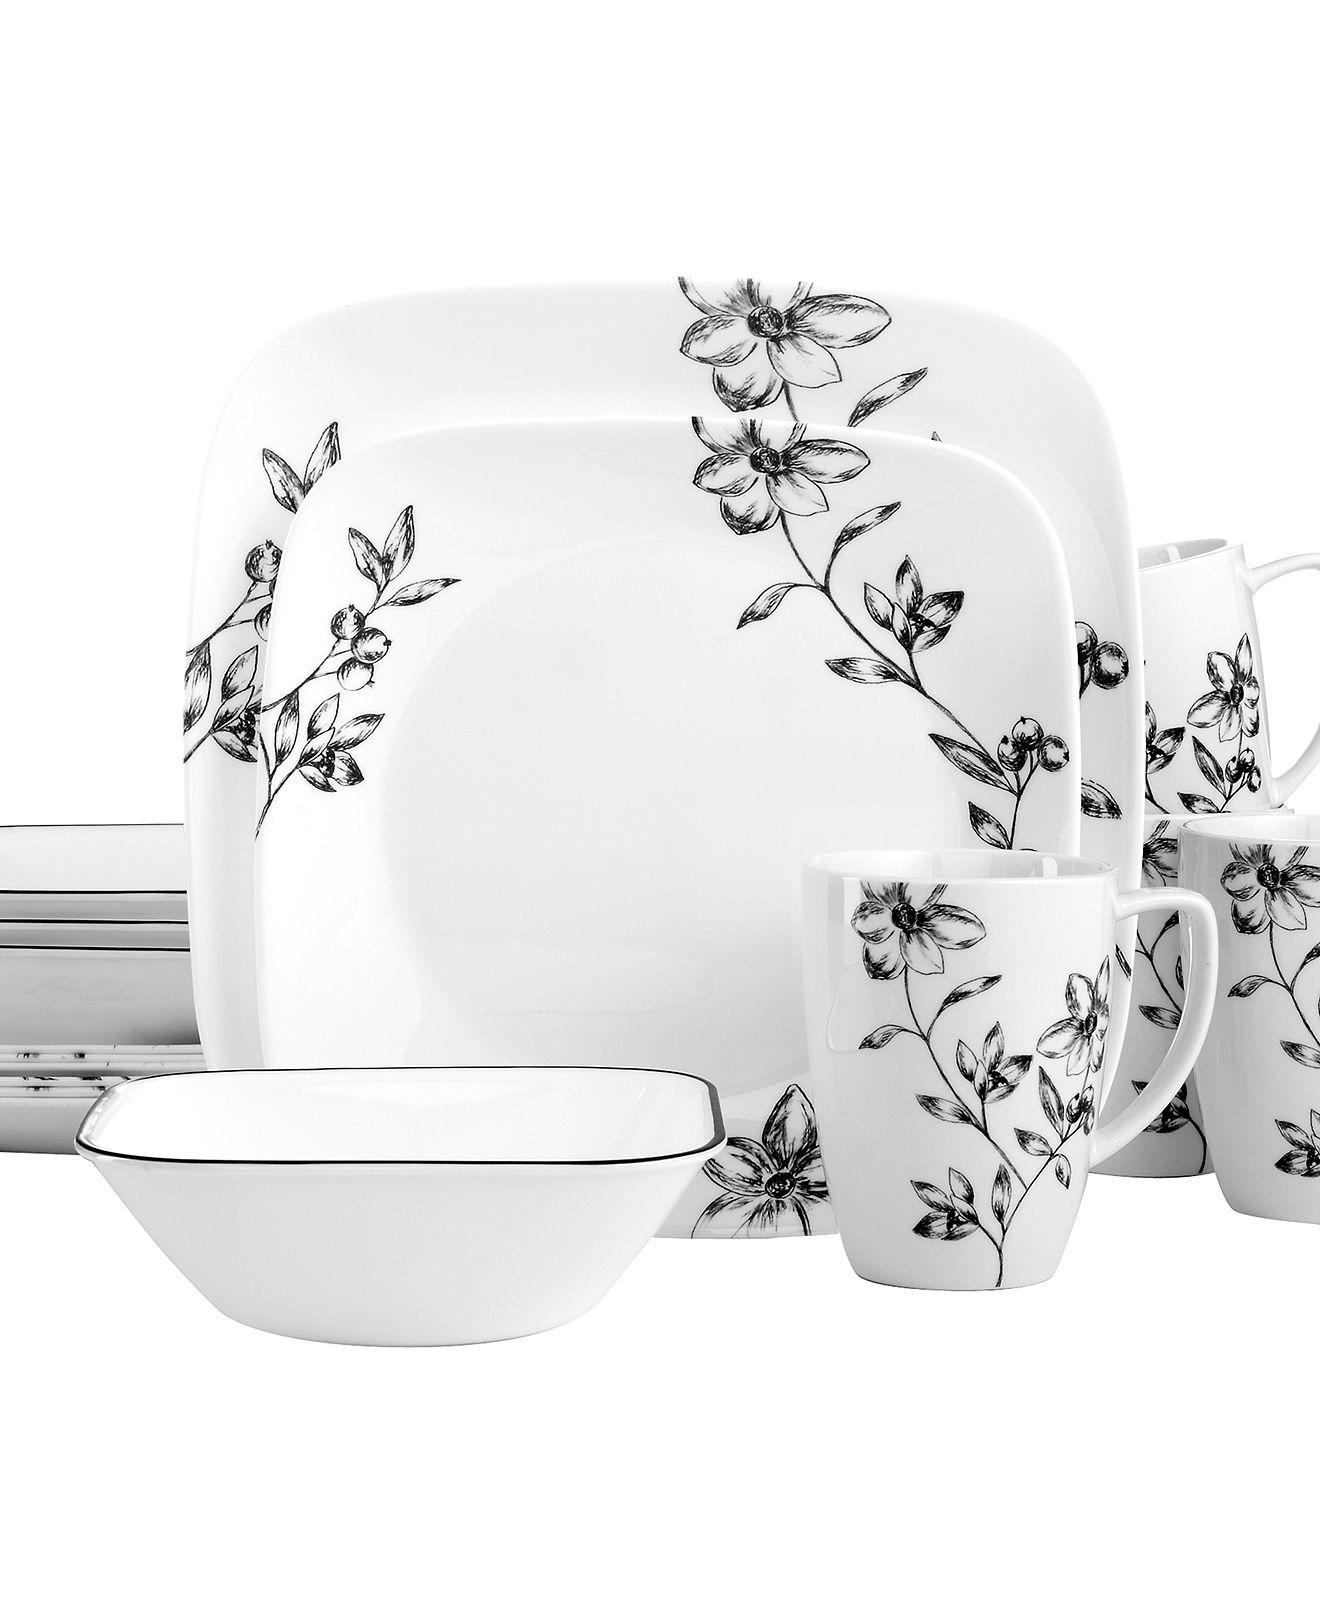 #Corelle Favourite Fleur dinnerware set @macys  sc 1 st  Pinterest & Corelle Favourite Fleur dinnerware set @macys | Pattern Inspiration ...